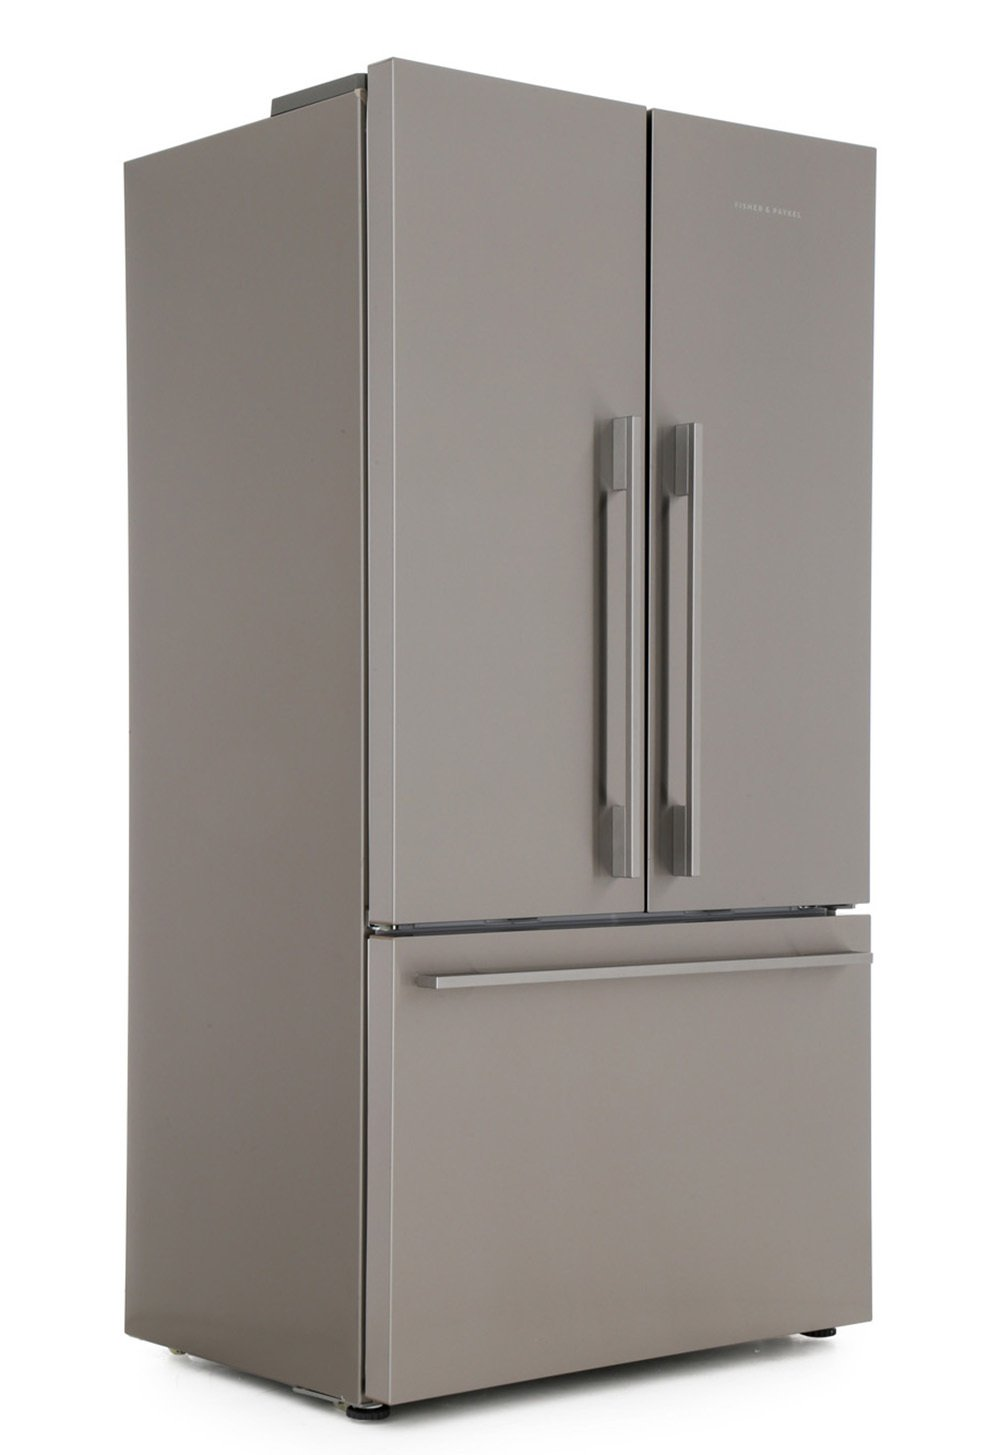 Fisher & Paykel Series 7 RF610ADX4 American Fridge Freezer